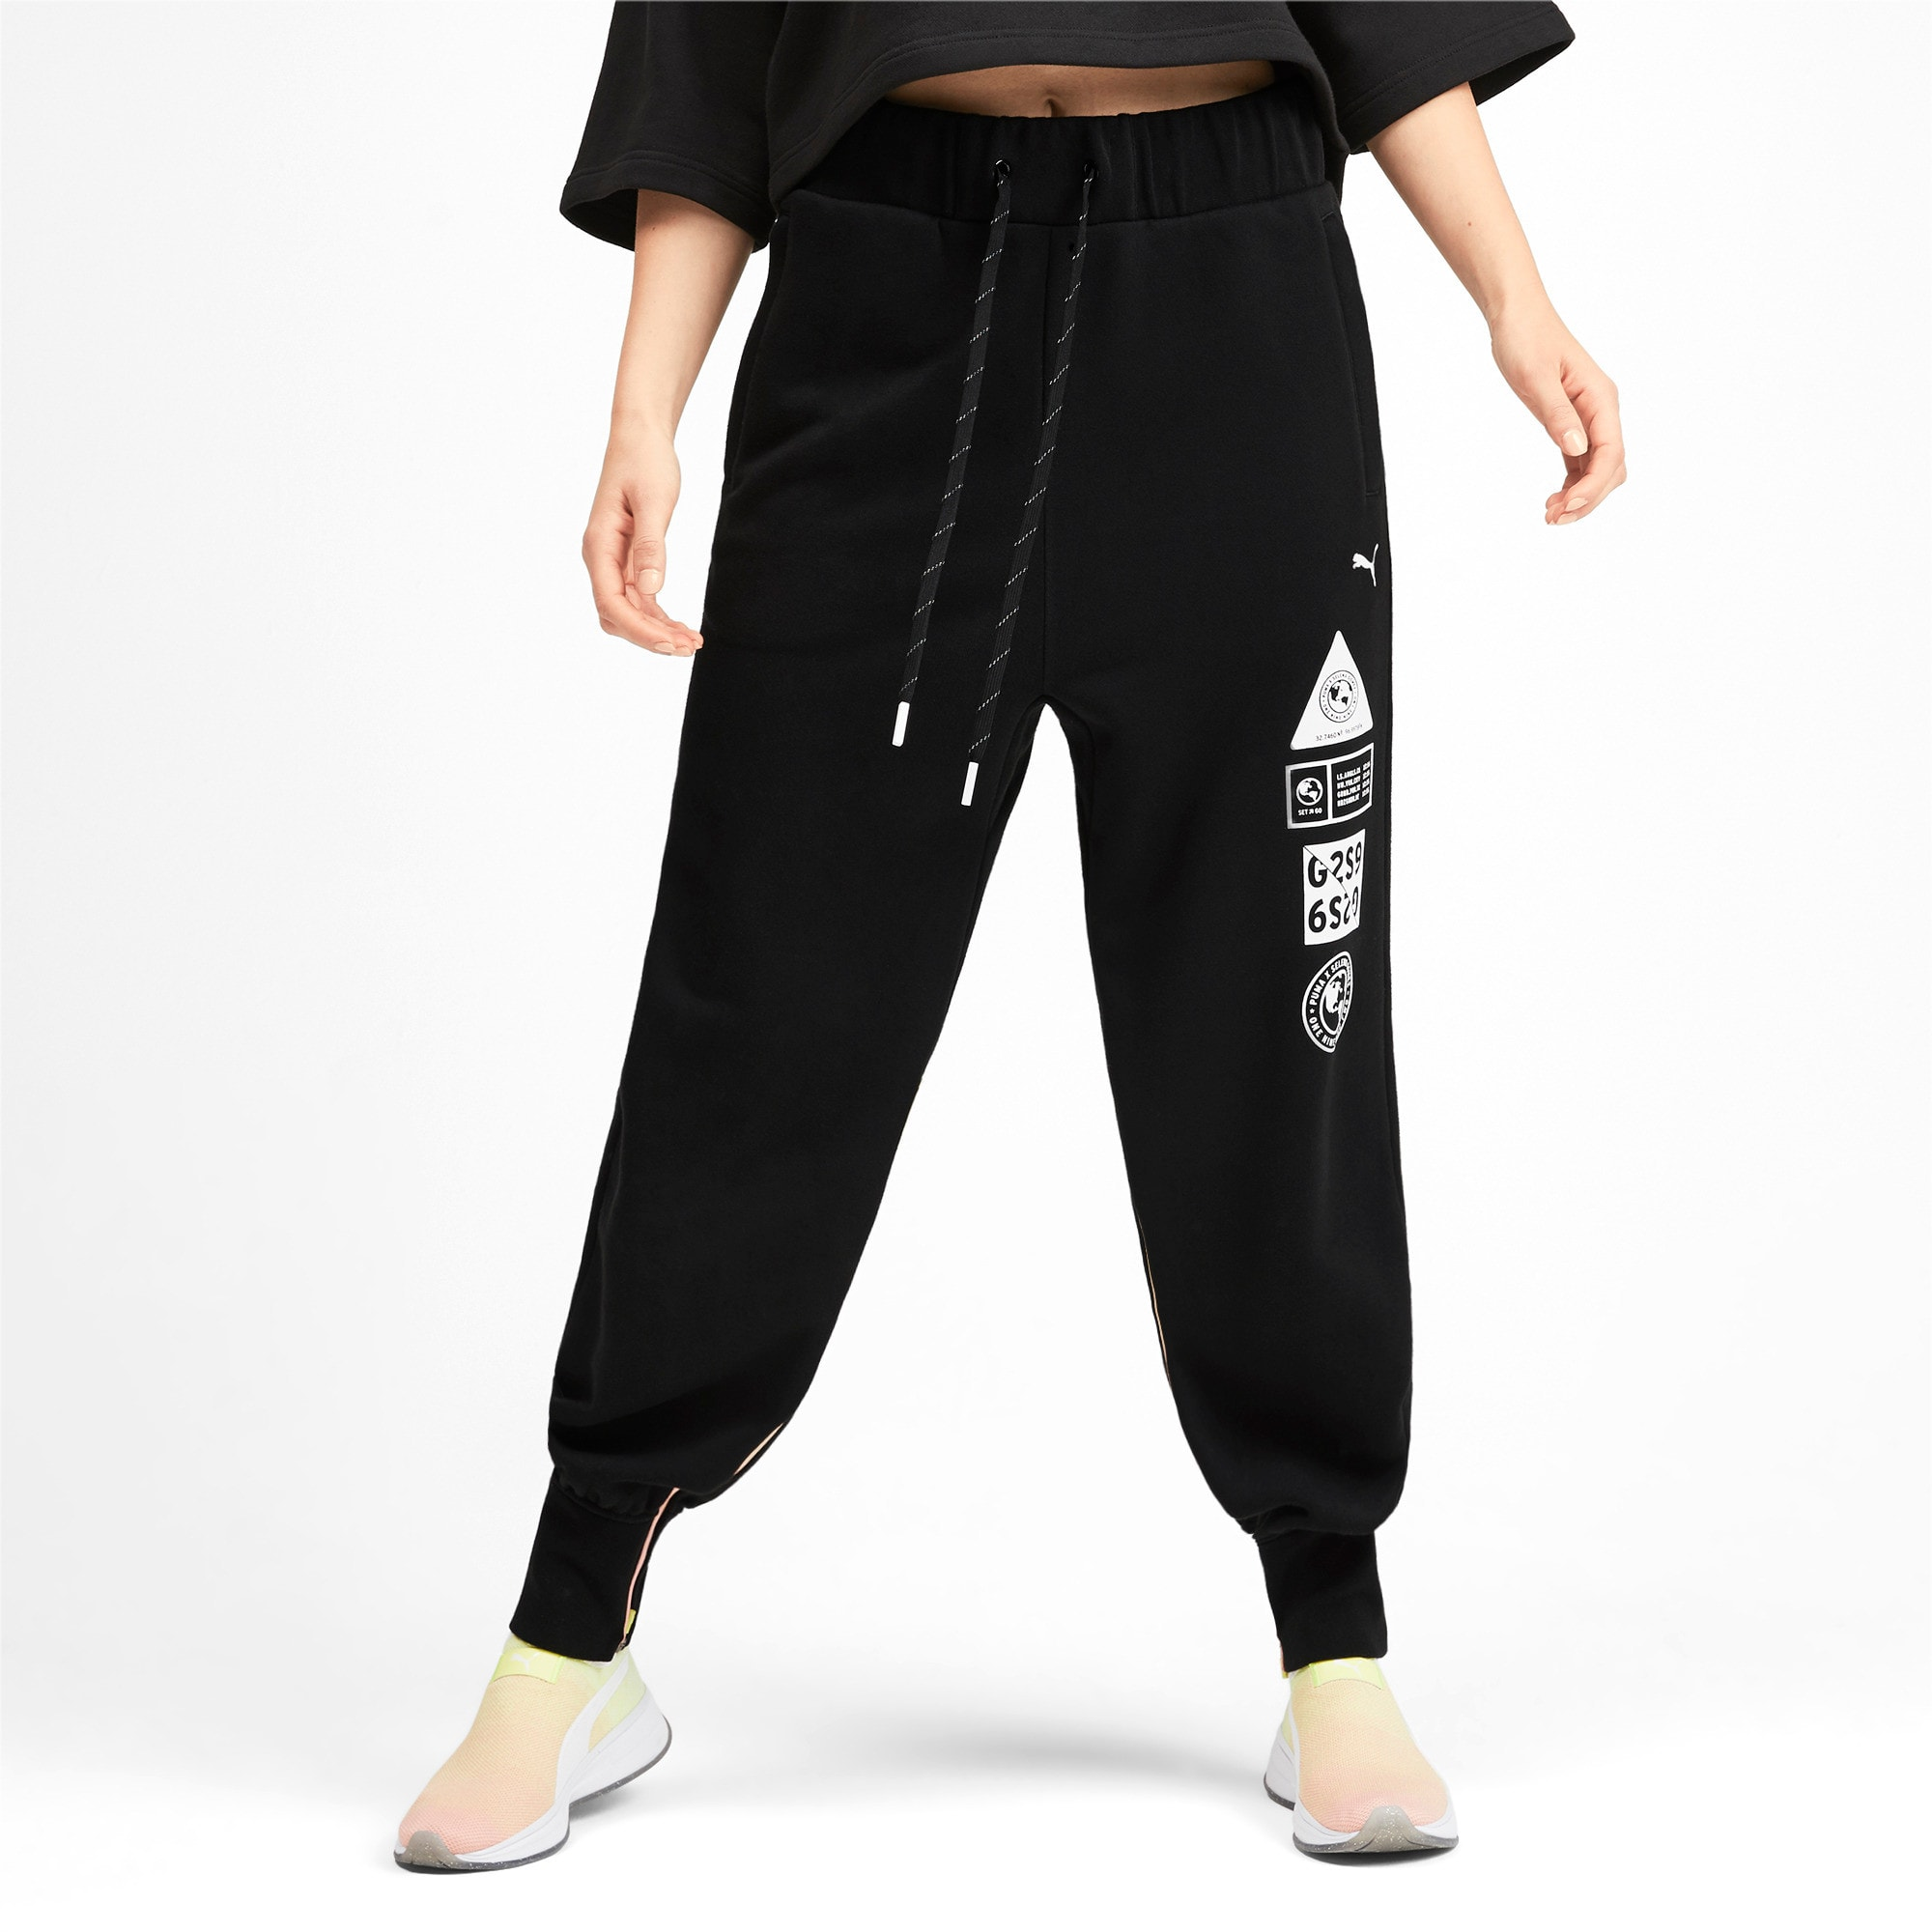 Thumbnail 1 of PUMA x SELENA GOMEZ Women's Sweatpants, Puma Black, medium